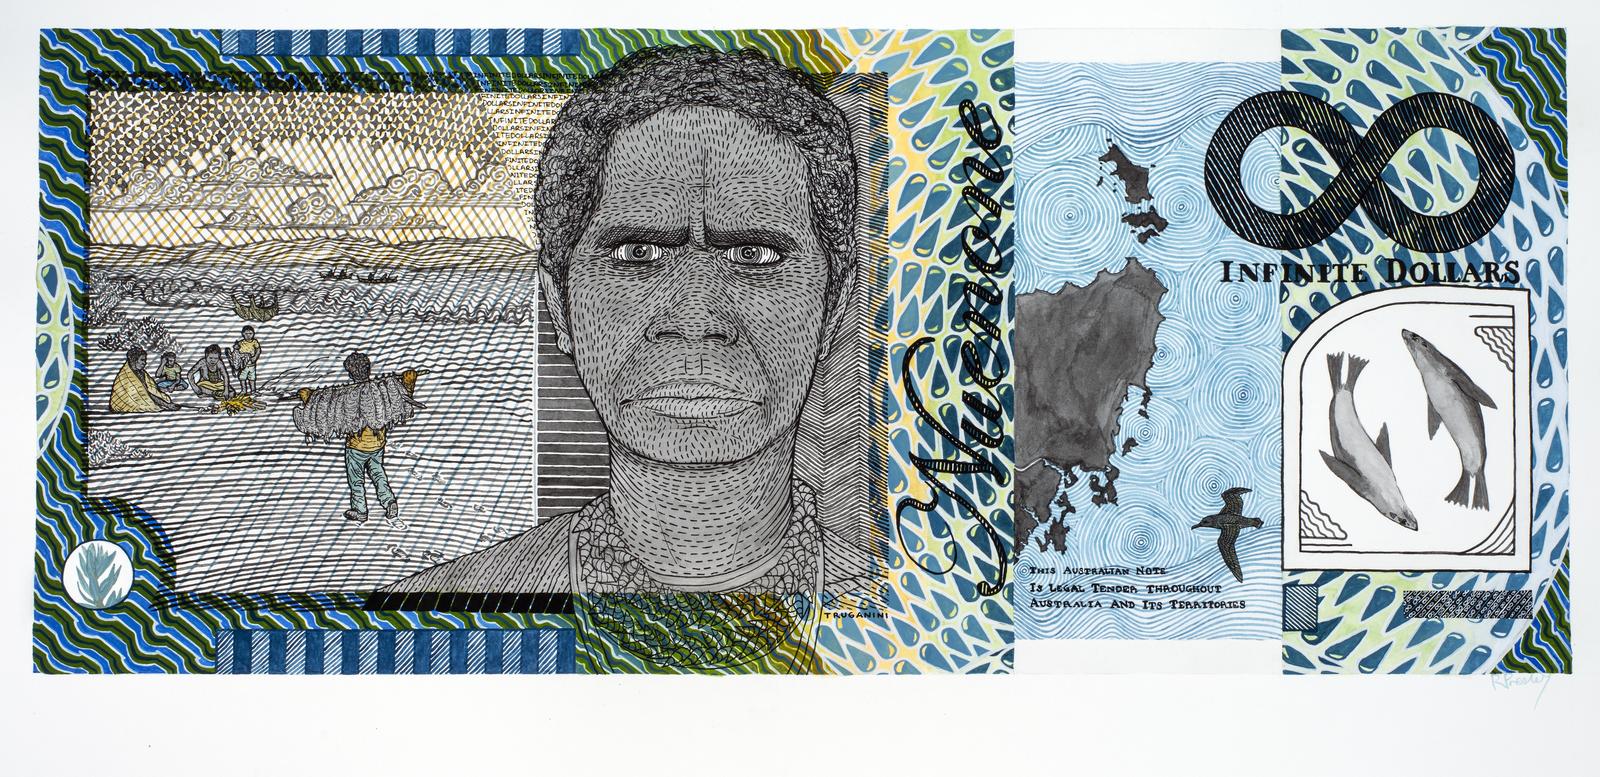 Truganini (c 1812-1876) Blood Money – Infinite Dollar Note – Truganini Commemorative 2011